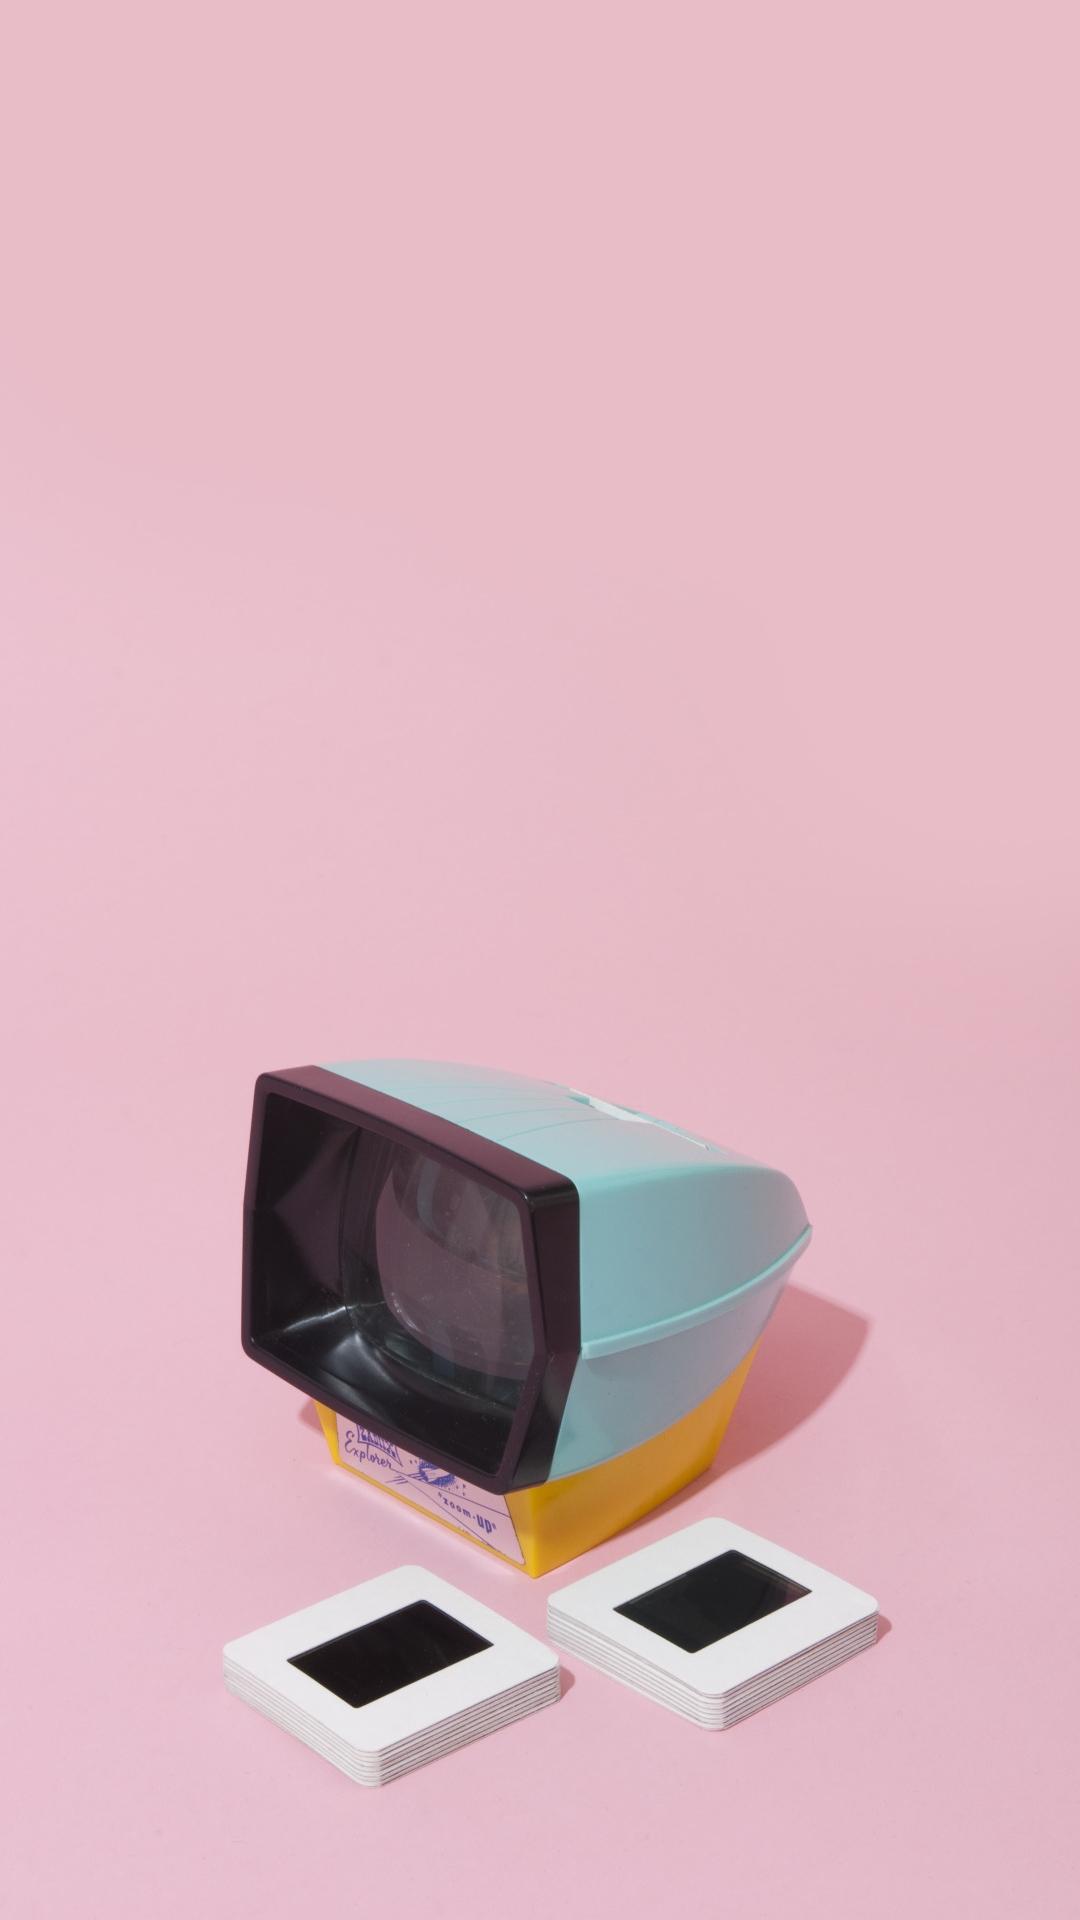 pink#girl#tumblr#aesthetic#bulletin#computer#90s   The